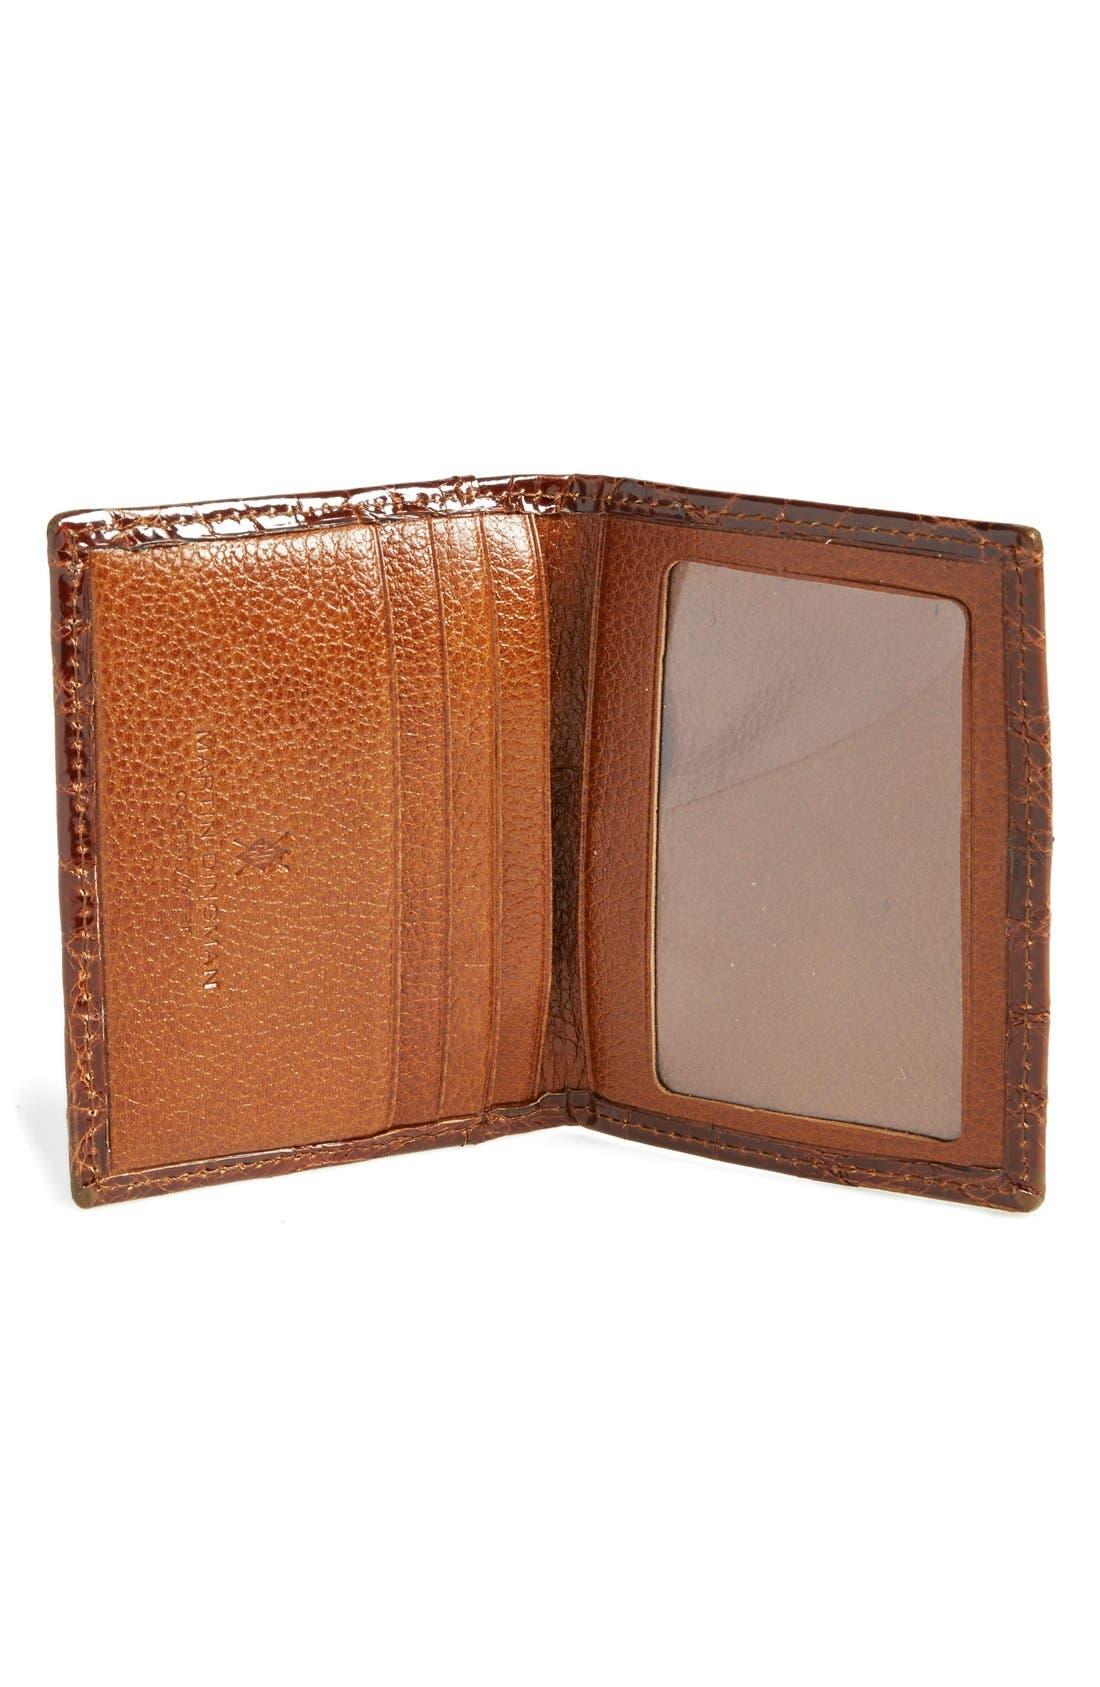 'Joseph' Genuine American Alligator Leather ID Wallet,                             Alternate thumbnail 3, color,                             COGNAC